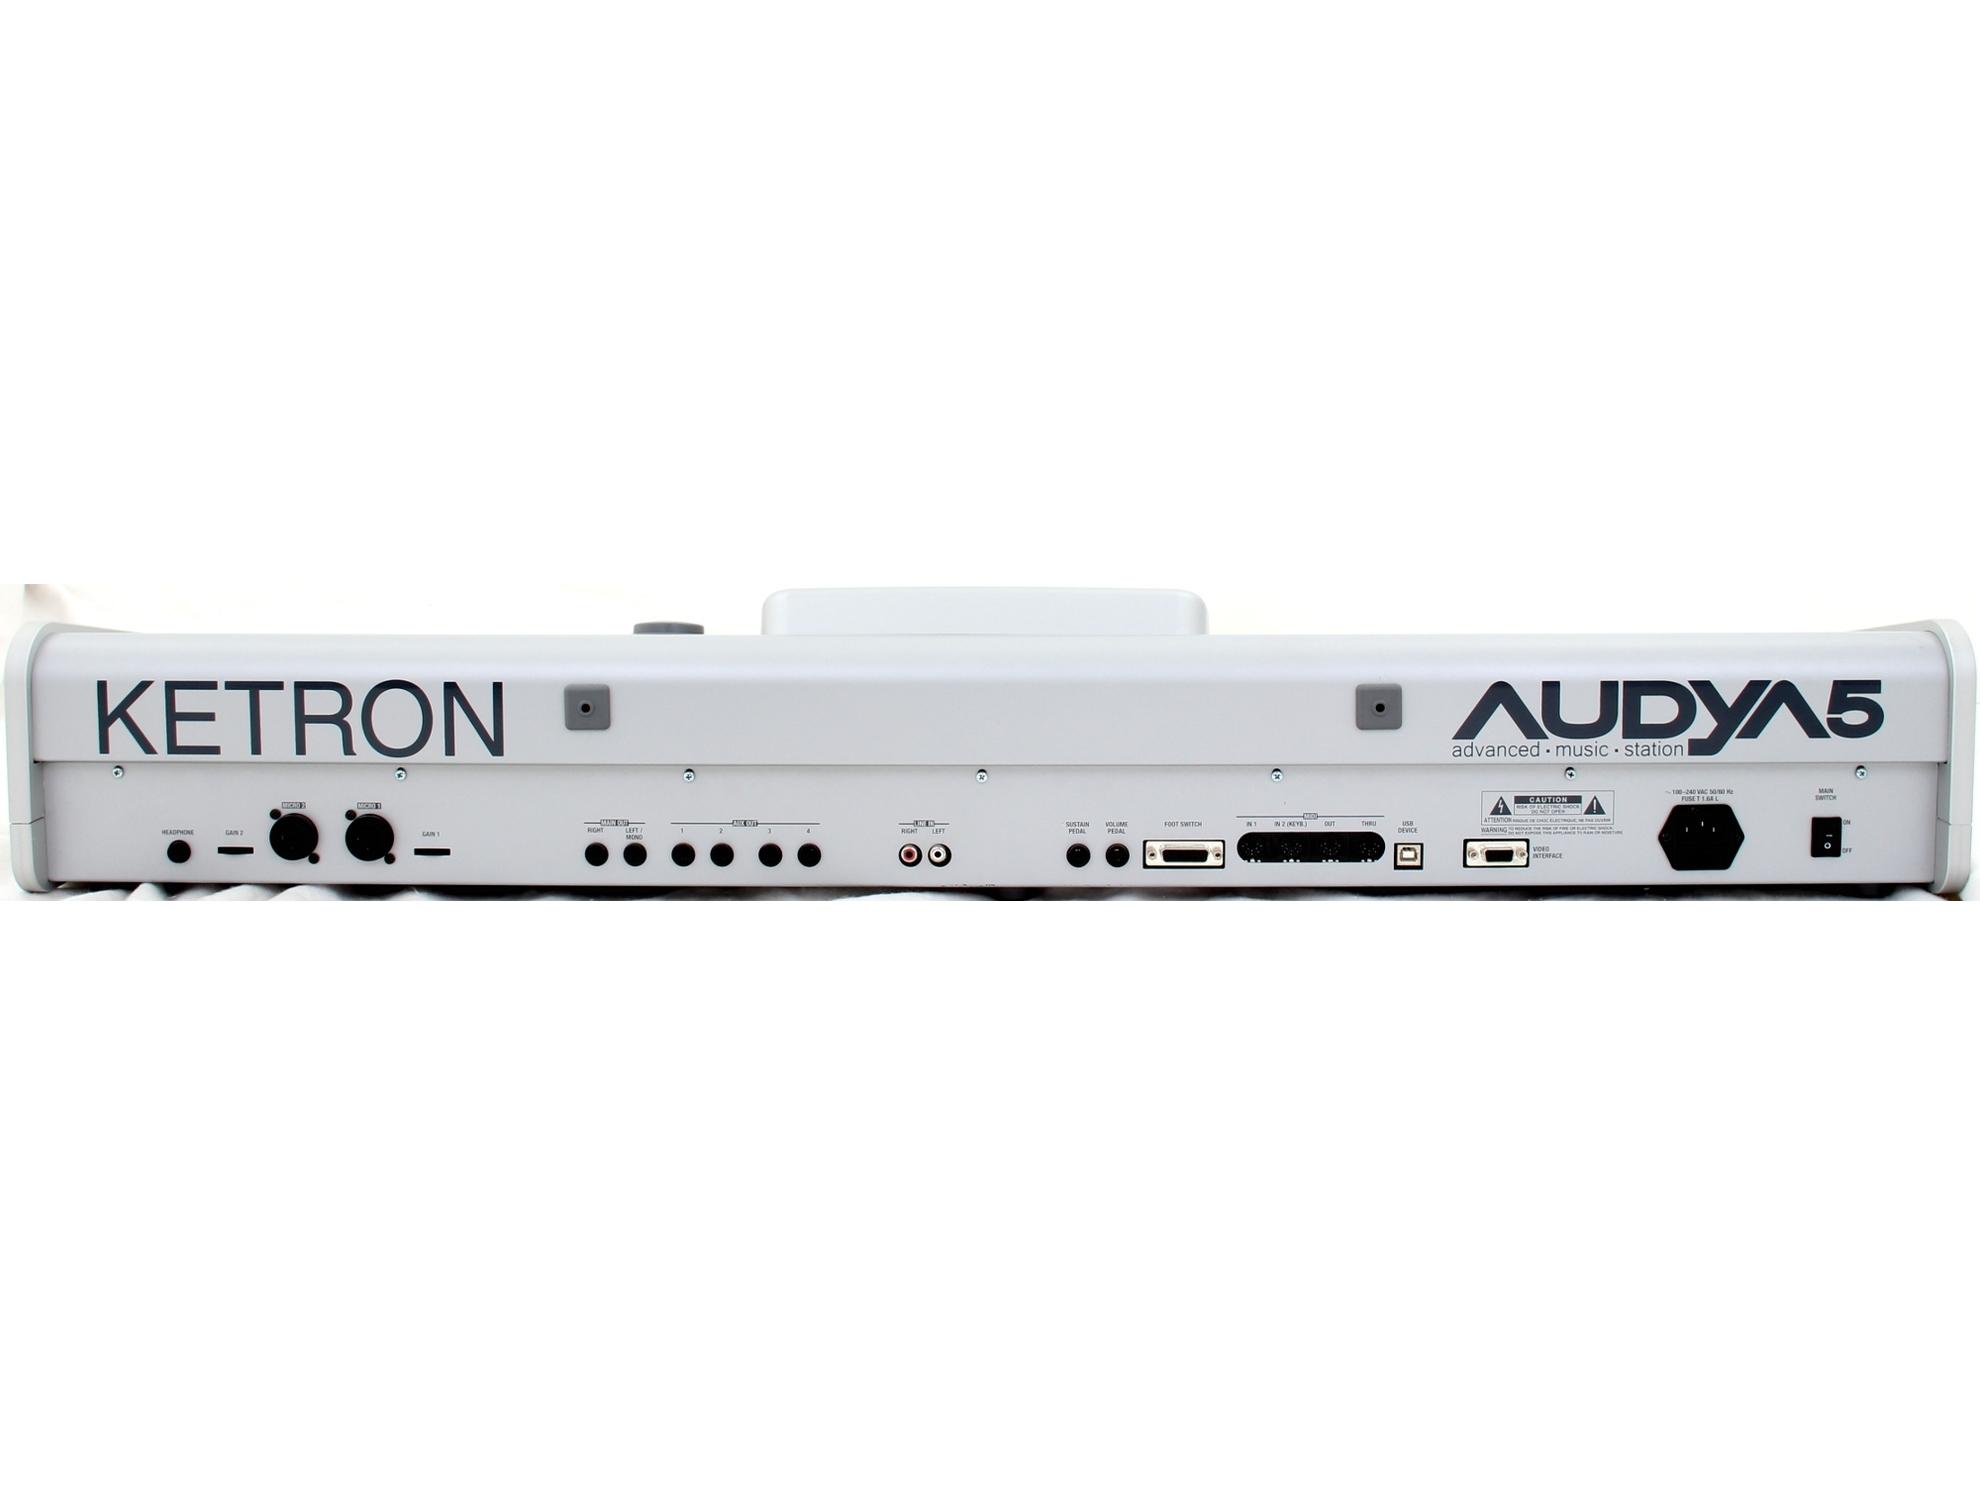 ketron audya 5 image 1465588 audiofanzine. Black Bedroom Furniture Sets. Home Design Ideas